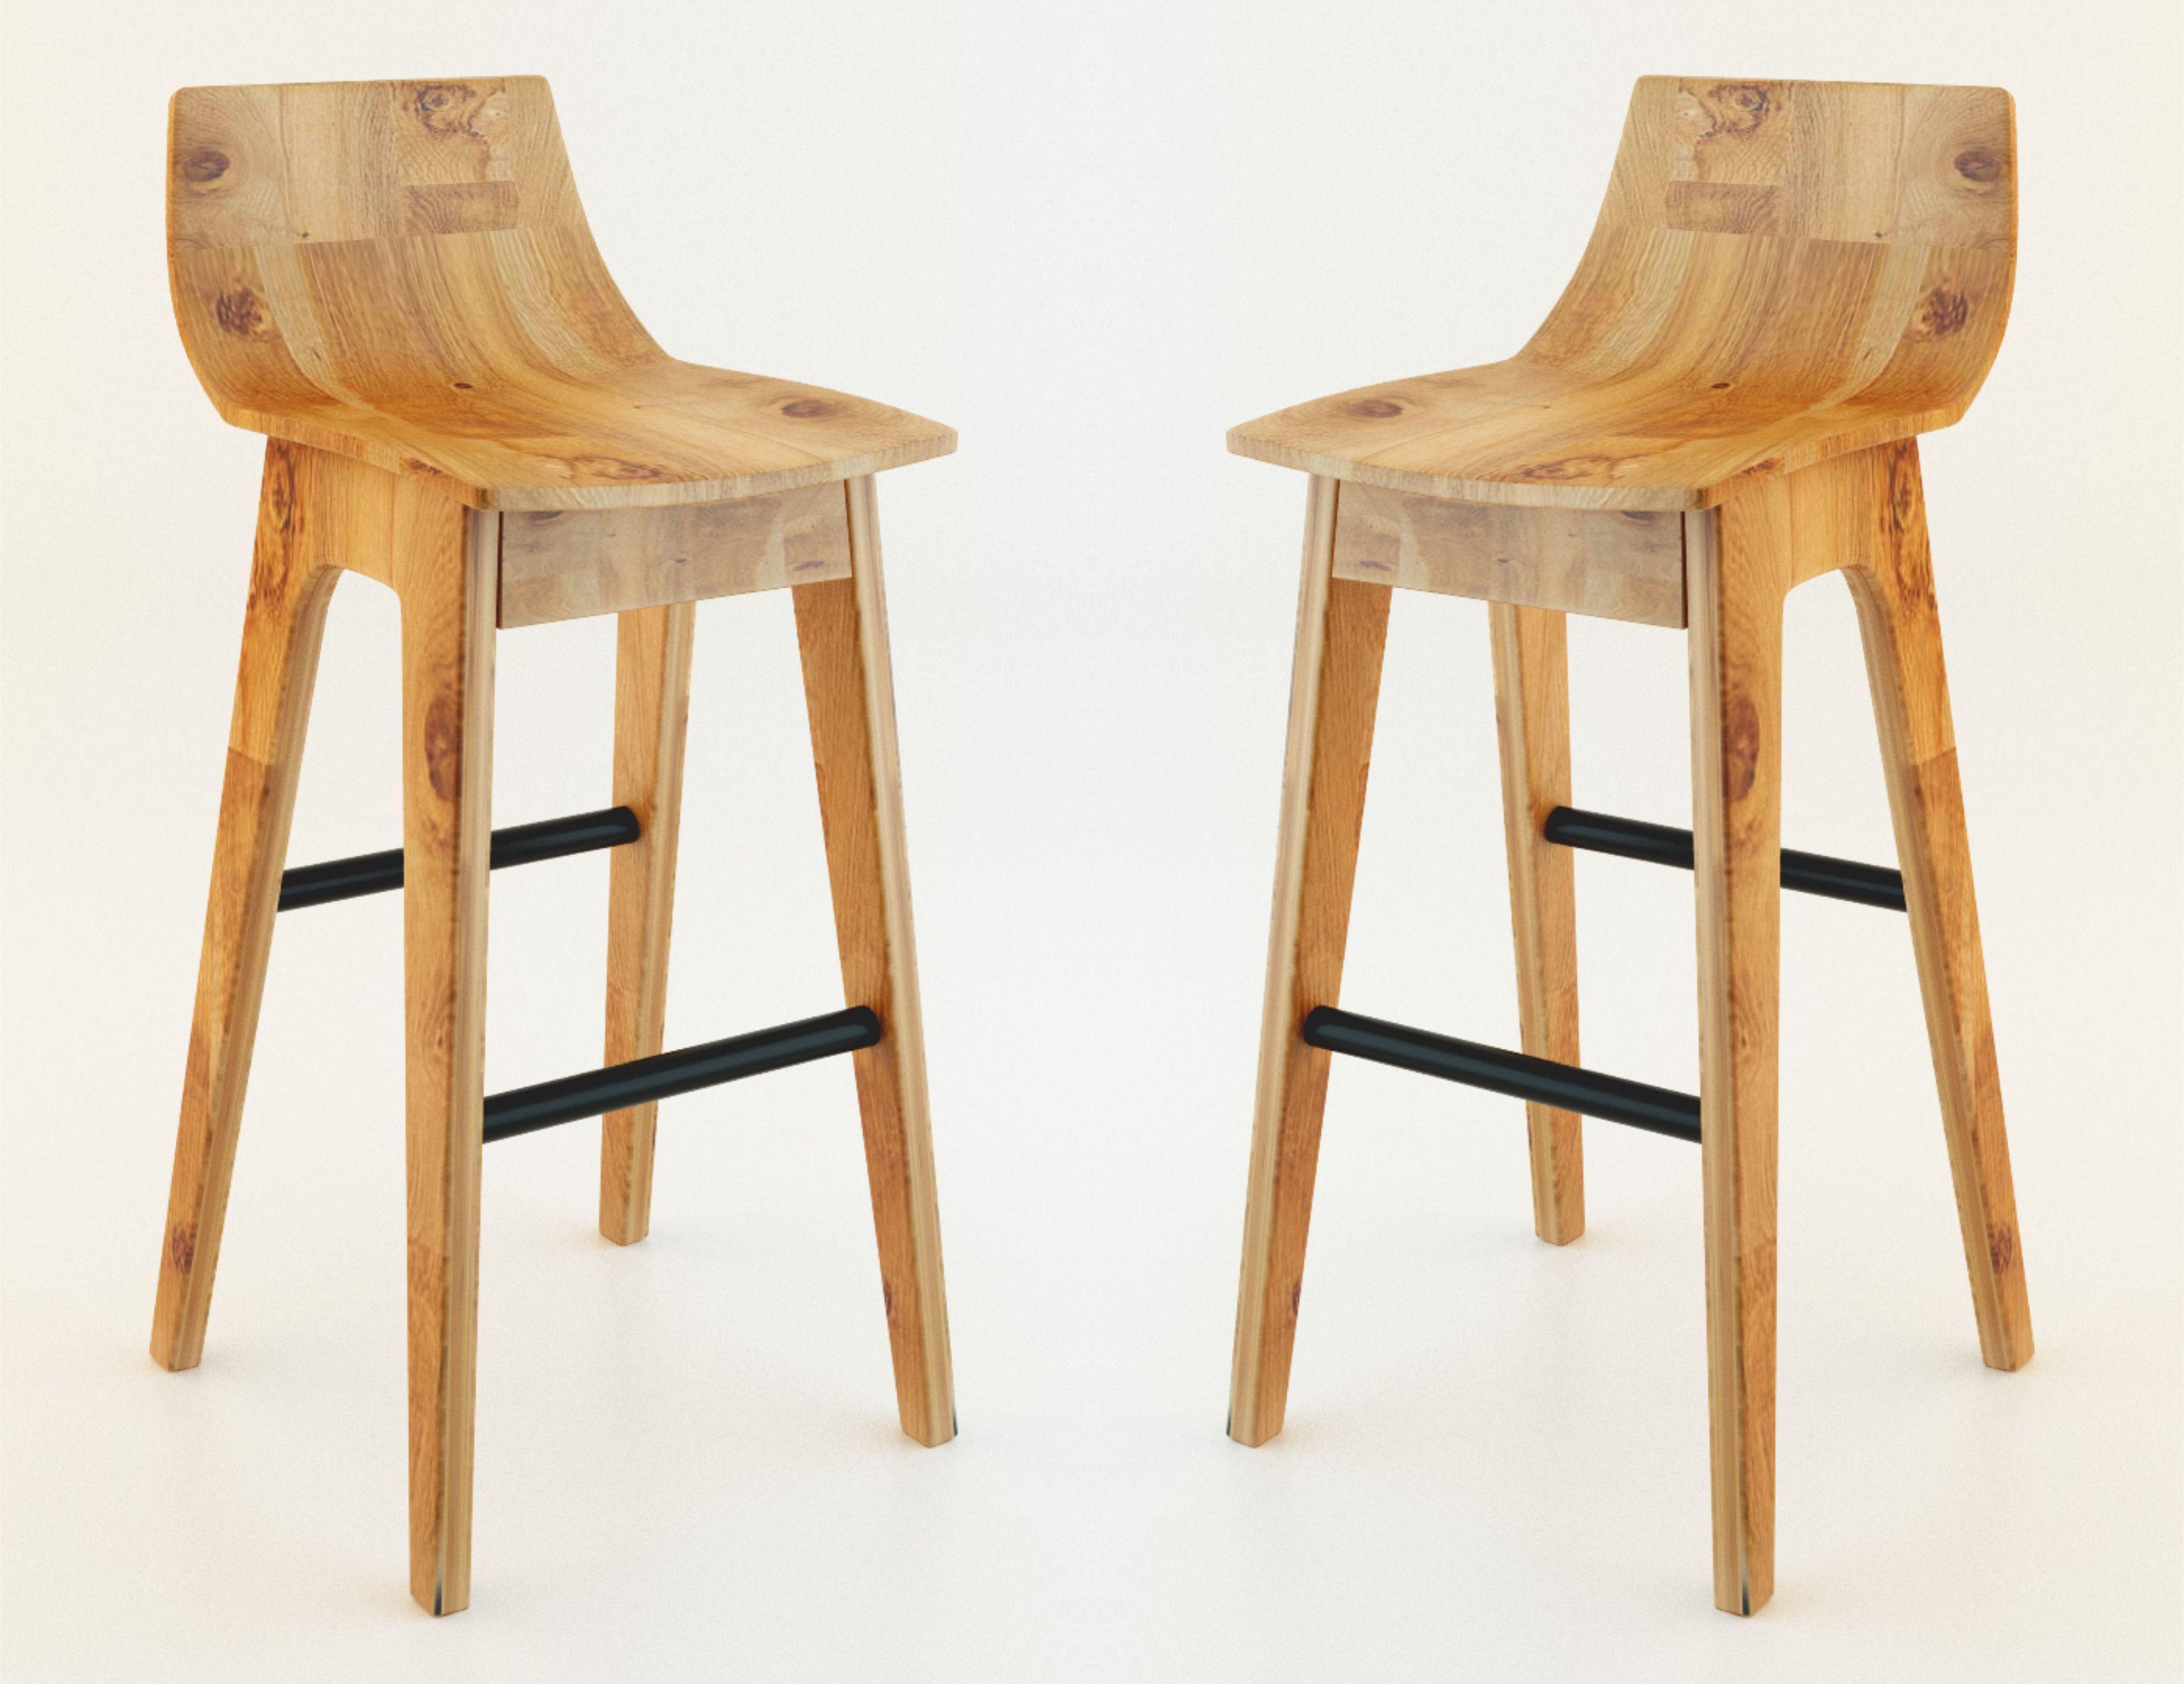 Wooden Bar Stool 3D Model max CGTradercom